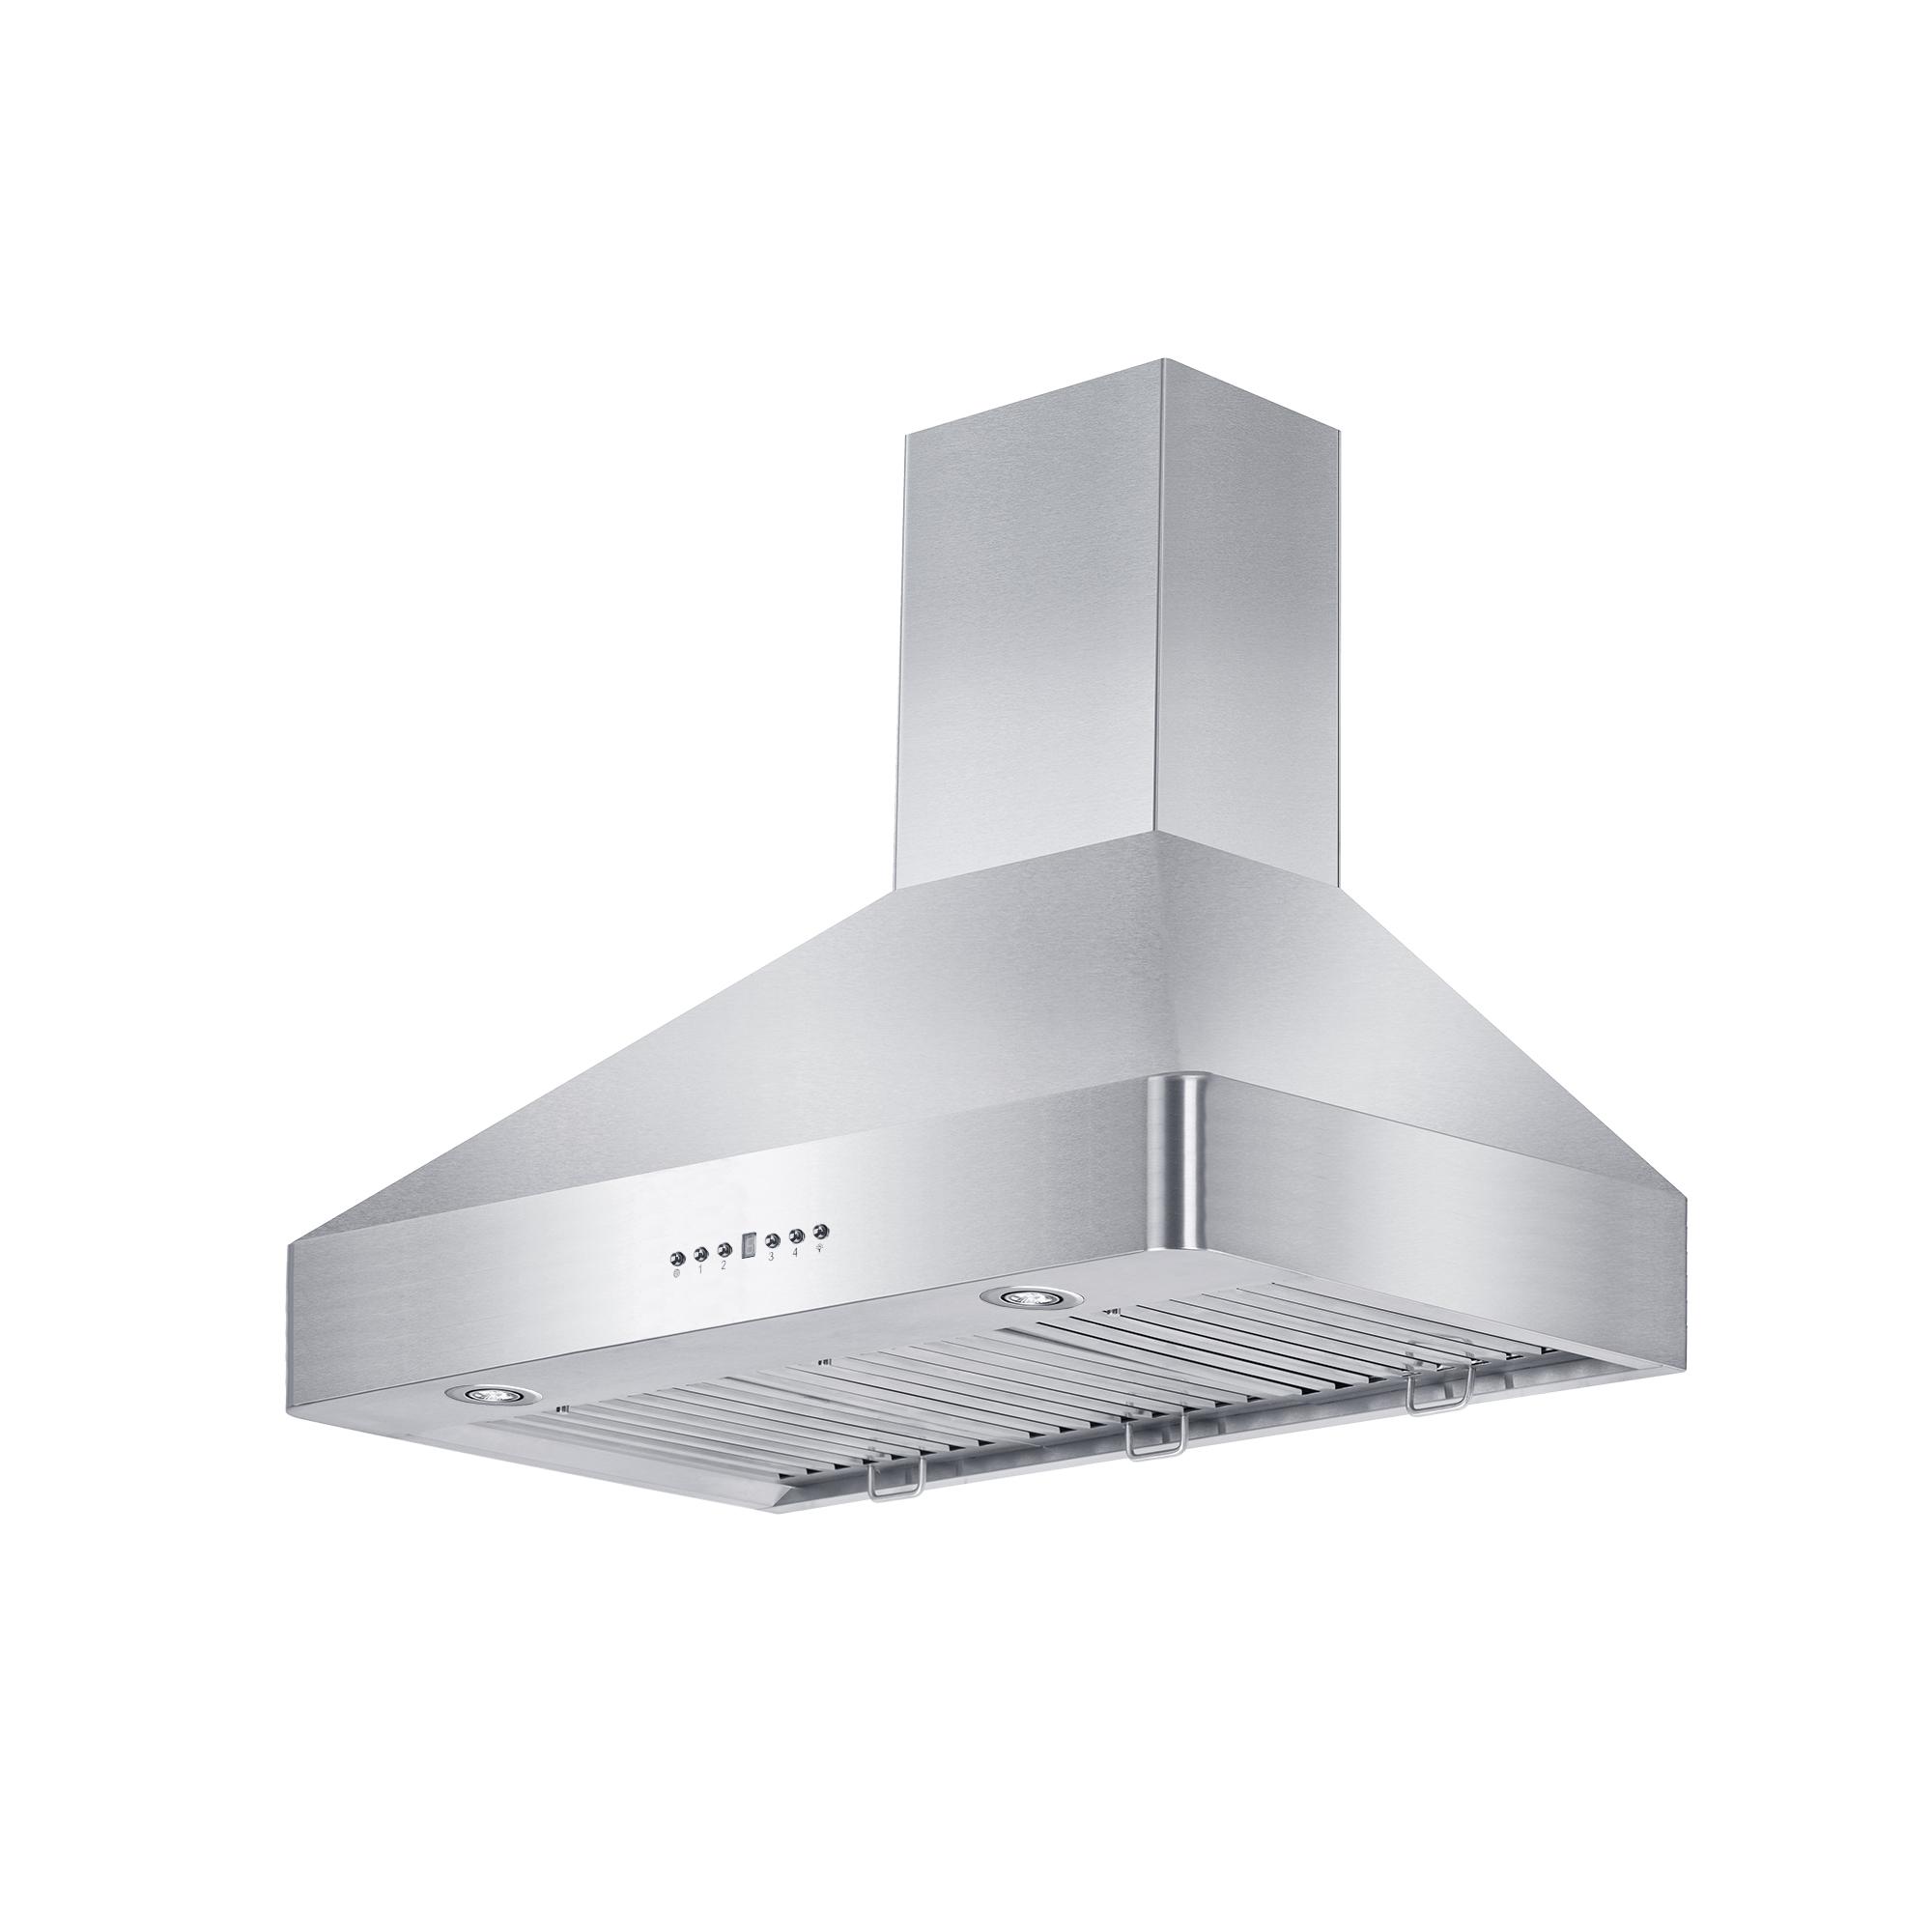 zline-stainless-steel-wall-mounted-range-hood-kf2-new-side-under.jpg